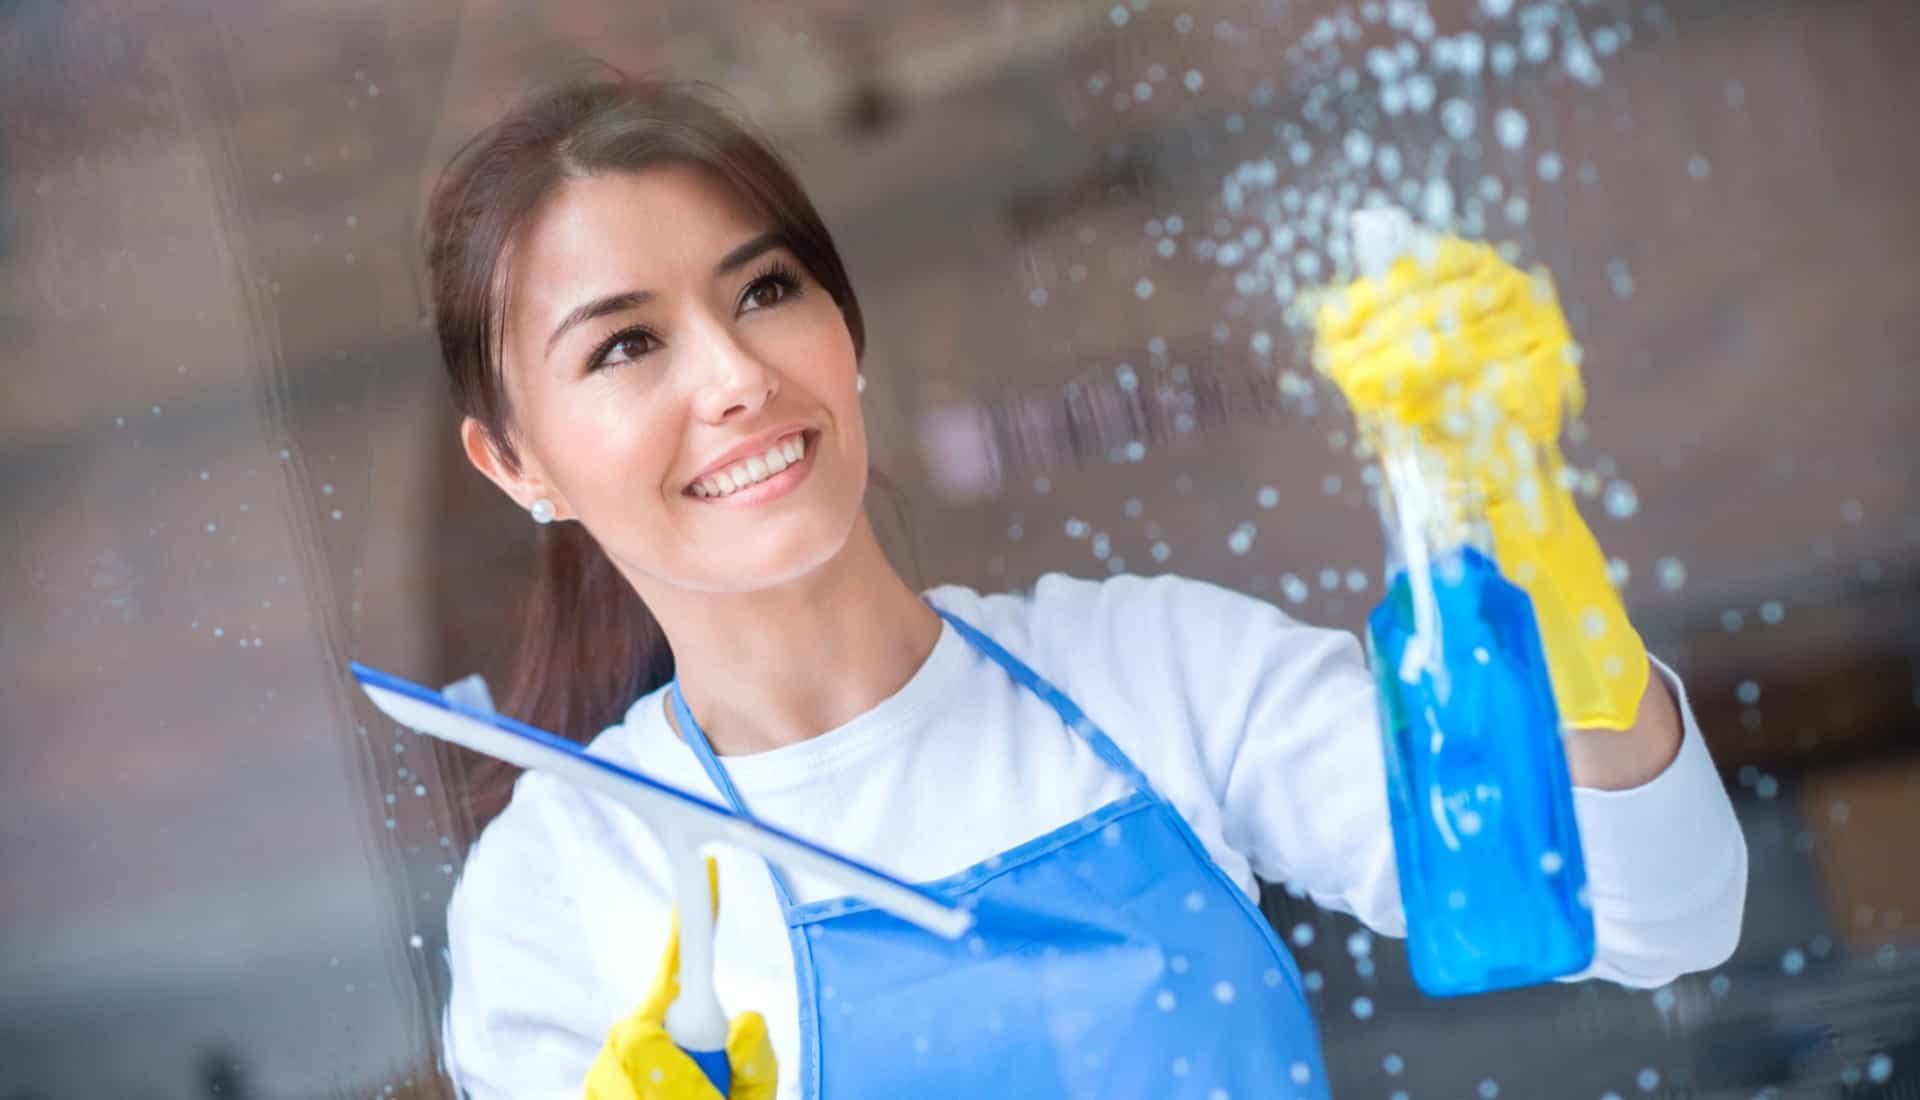 Limpeza de Vidros Vila Nova de Famalicão